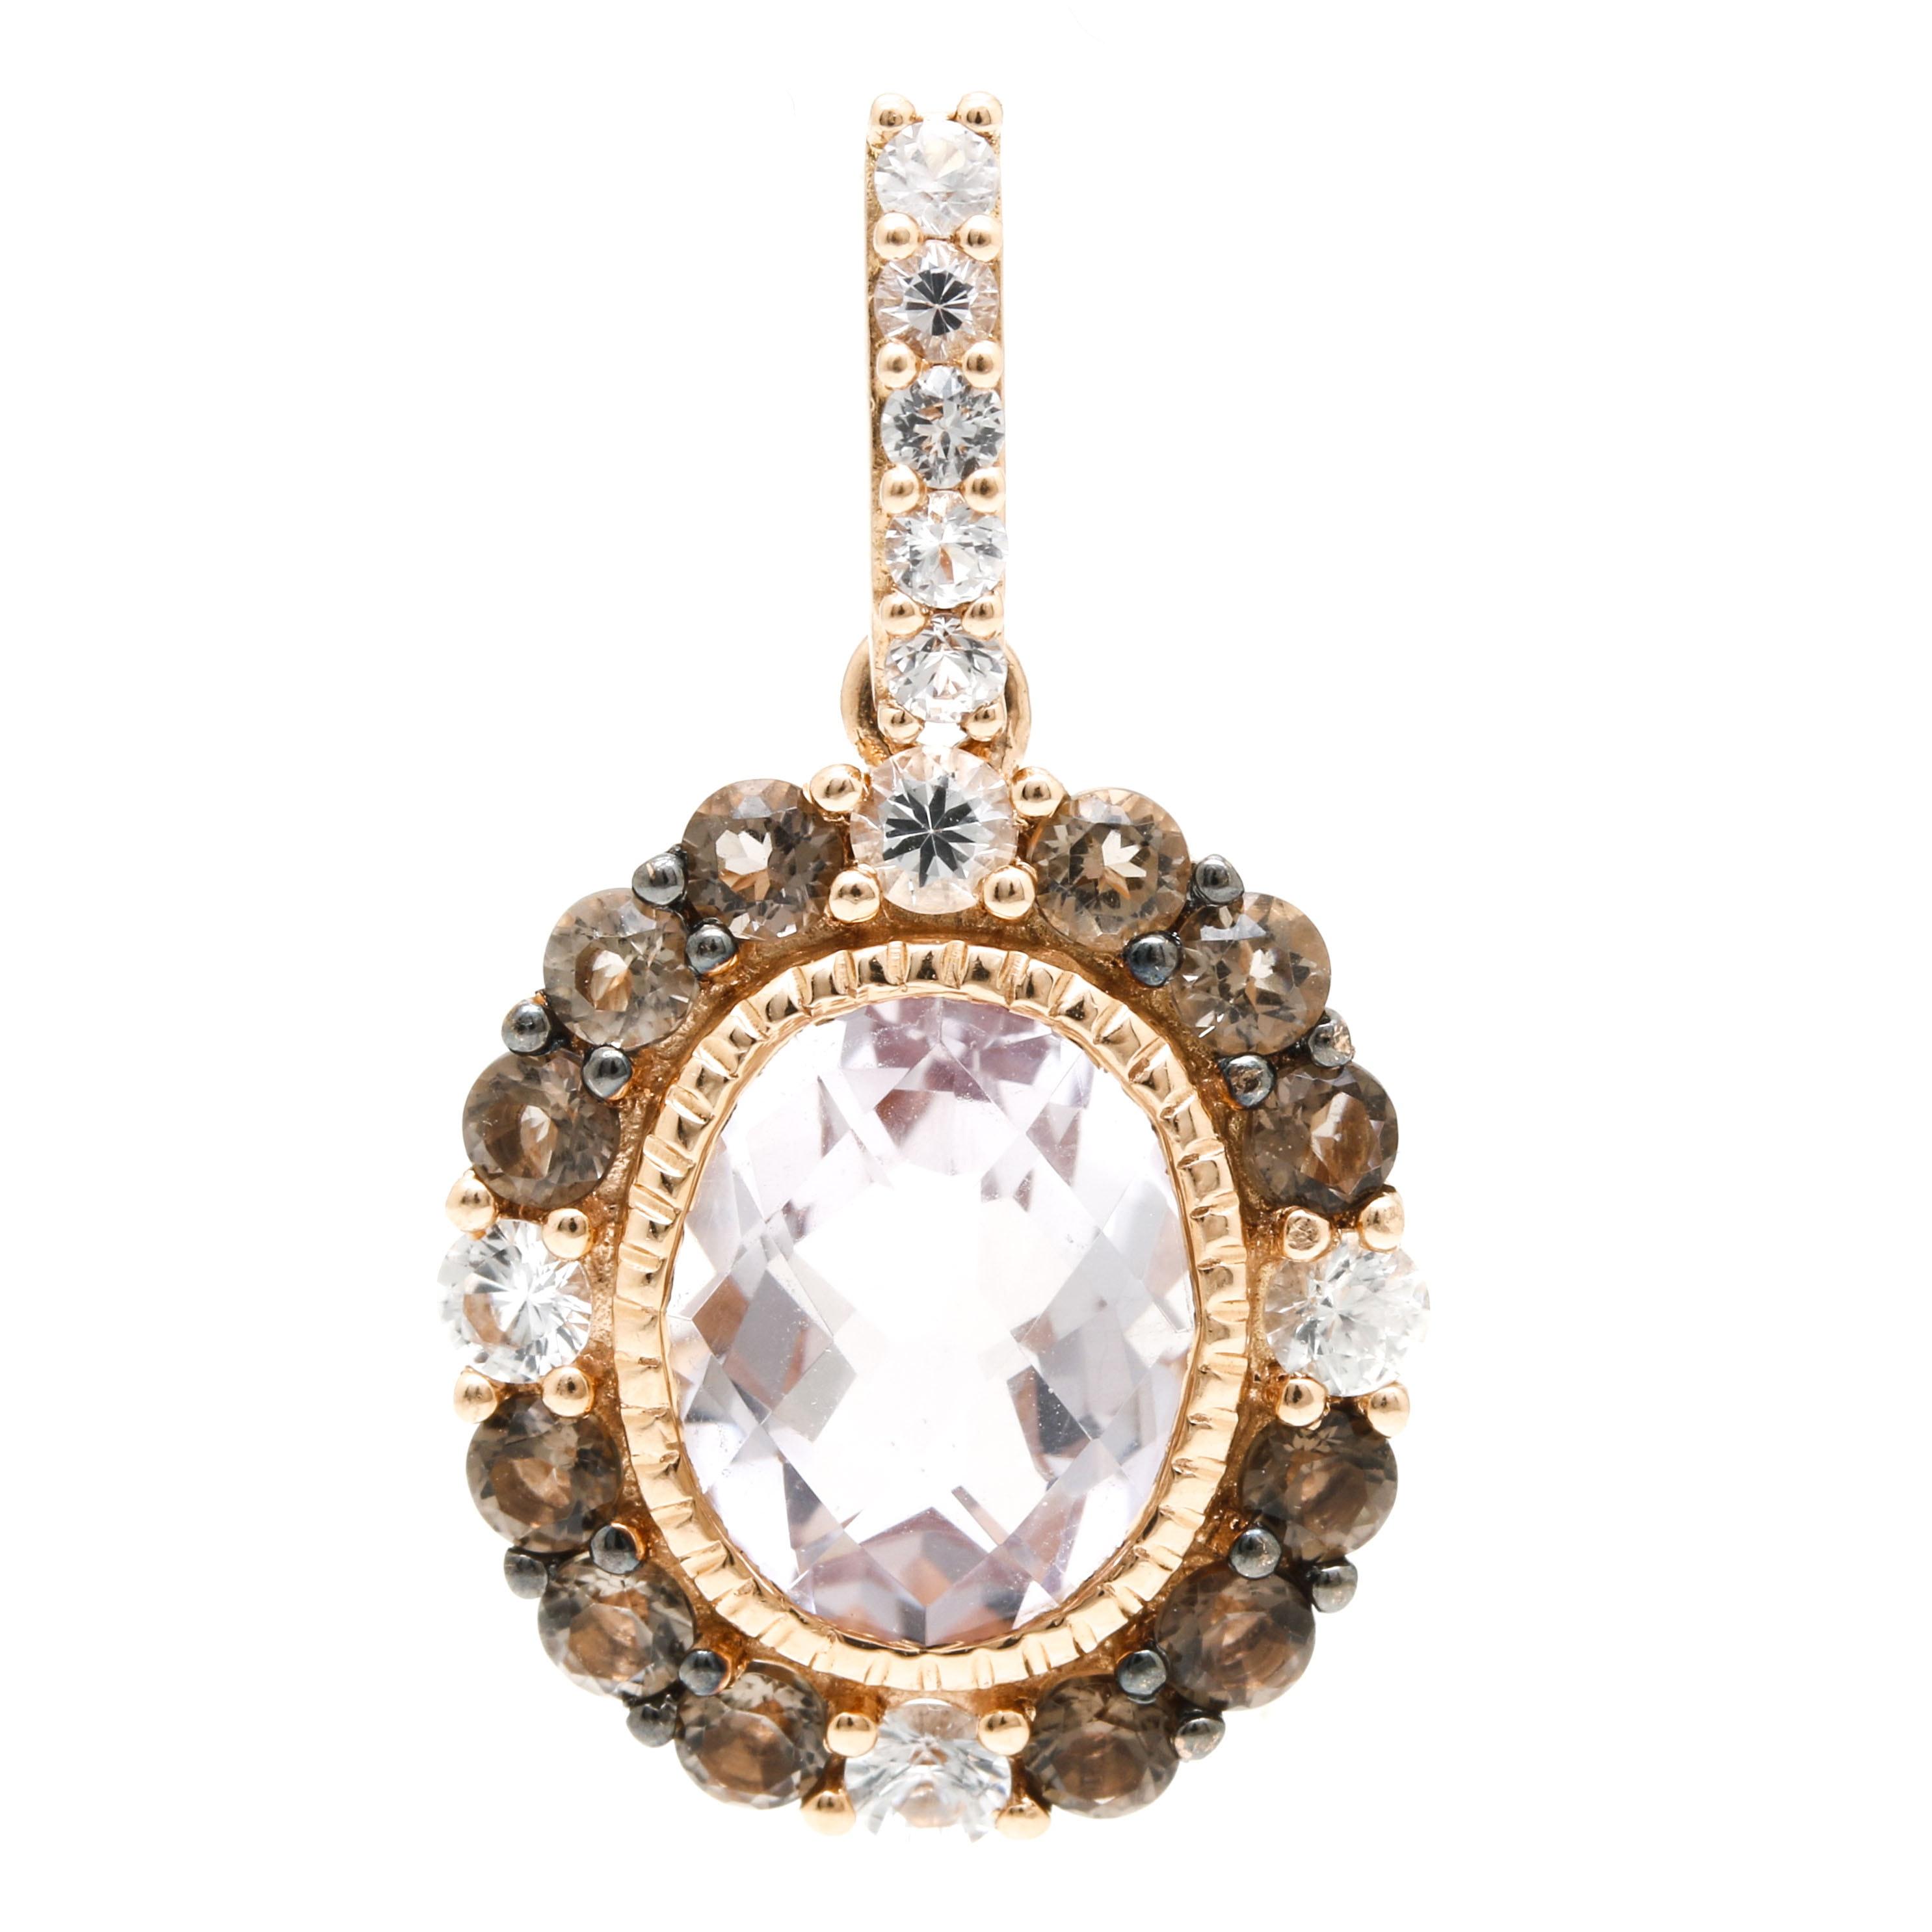 Le Vian 14K Rose Gold Amethyst, Smoky Quartz, and White Sapphire Pendant